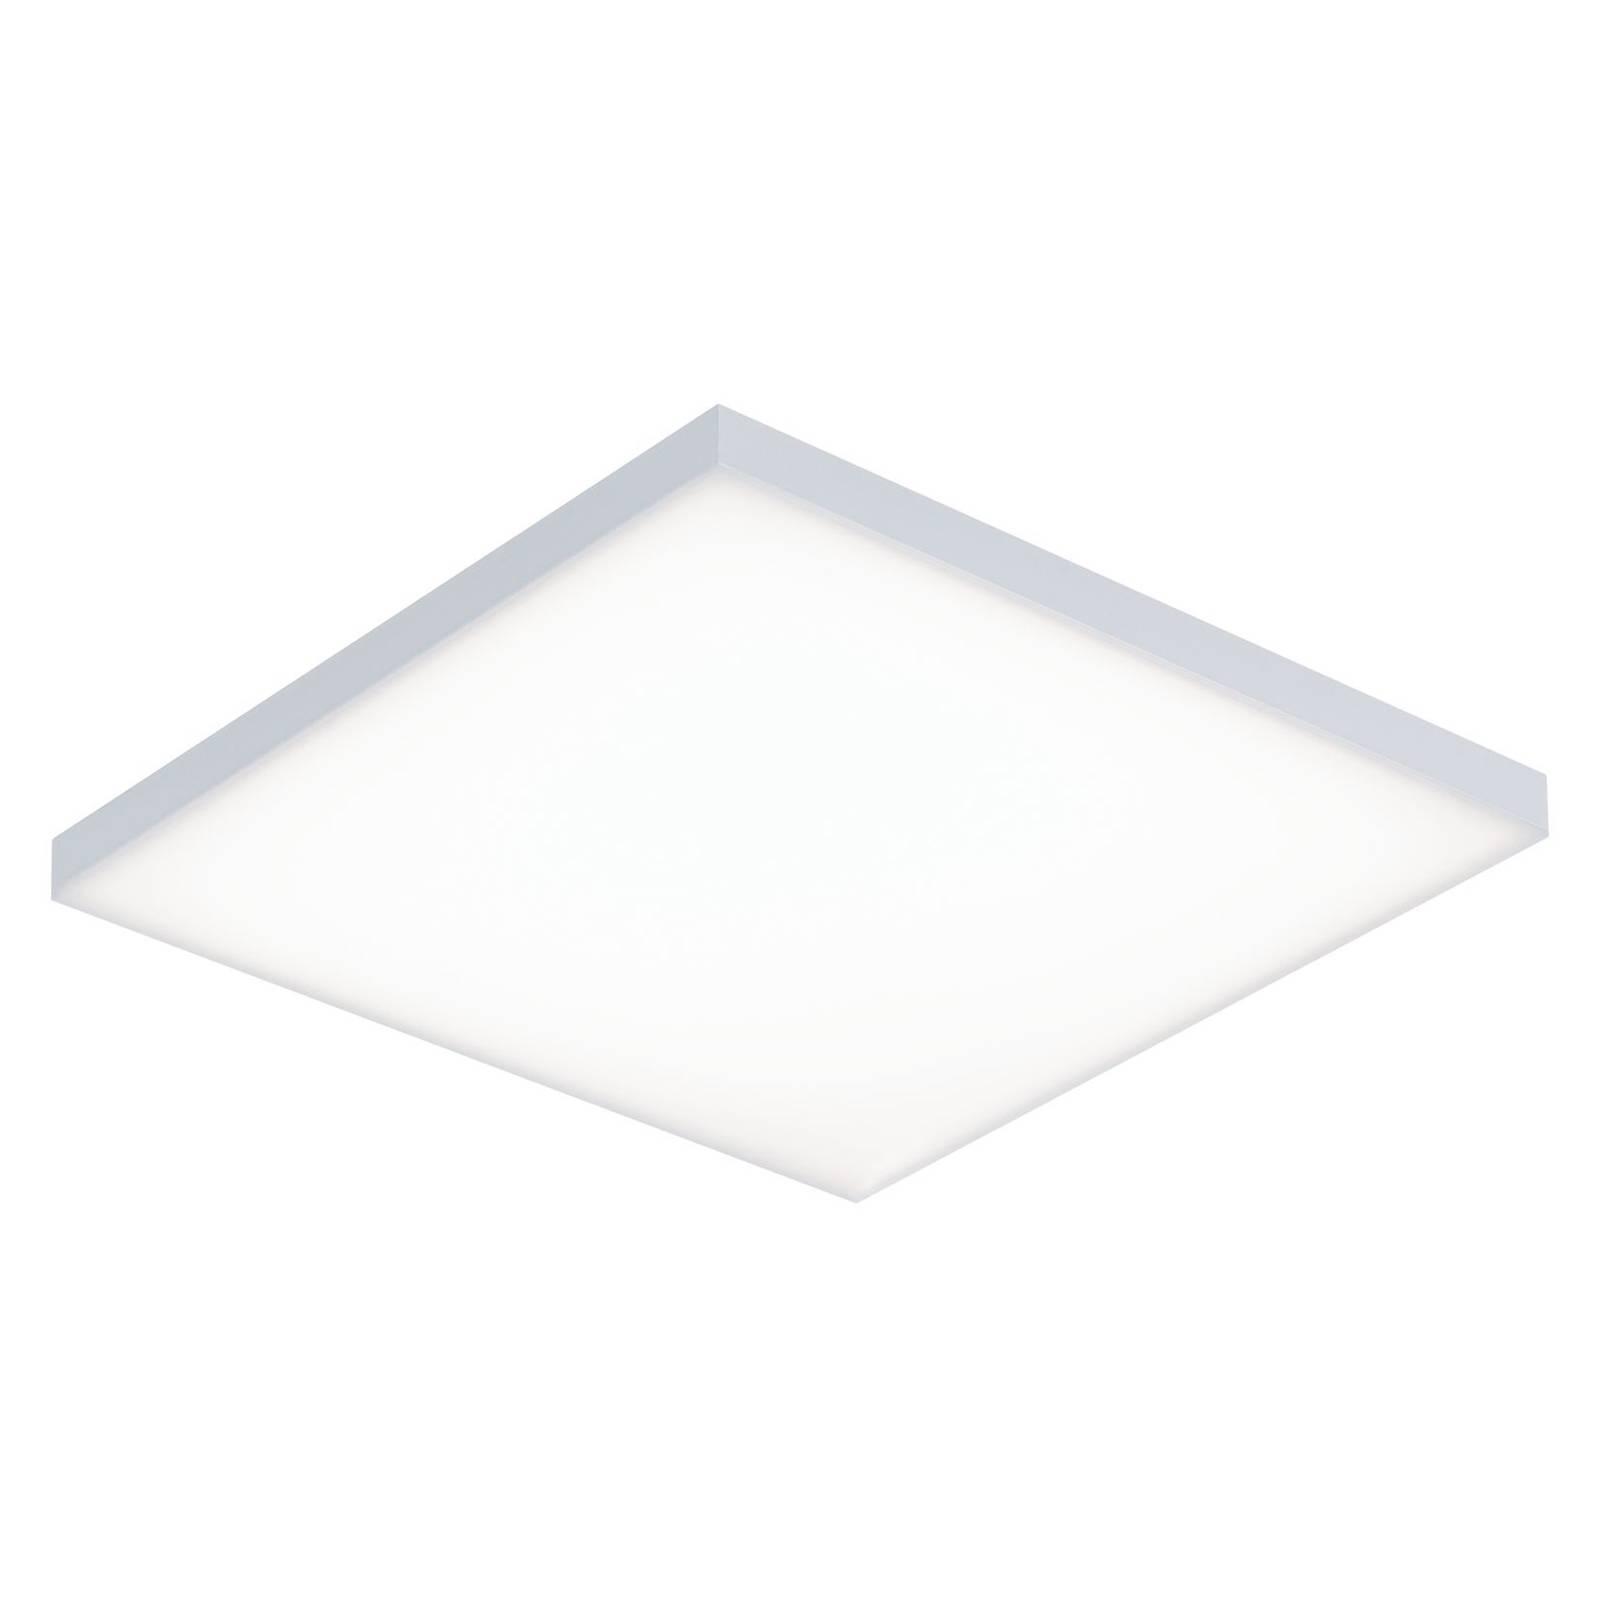 Paulmann Velora-LED-paneeli 3-step-dim 29,5x29,5cm